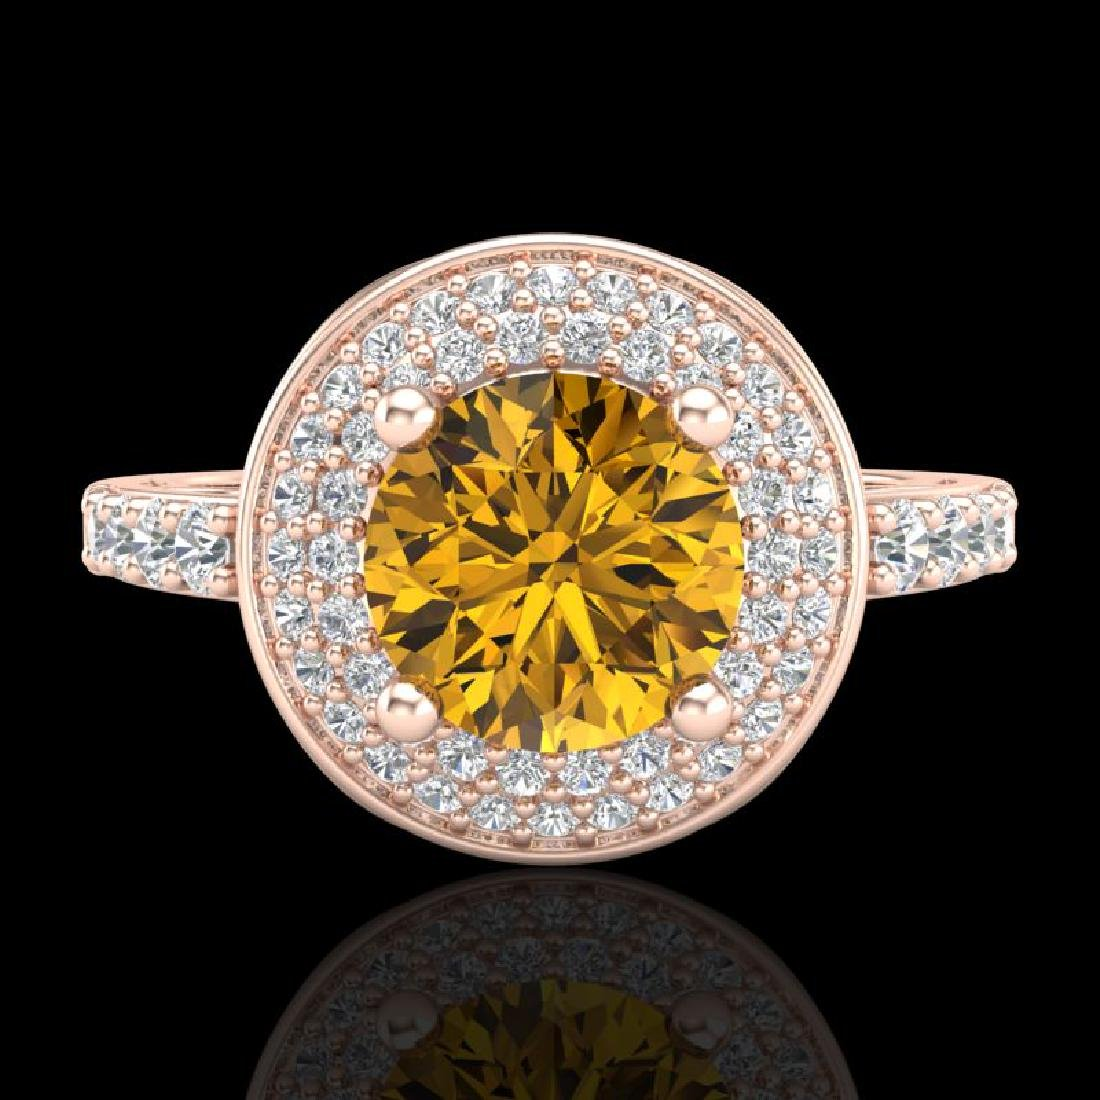 1.7 CTW Intense Fancy Yellow Diamond Engagement Art - 2